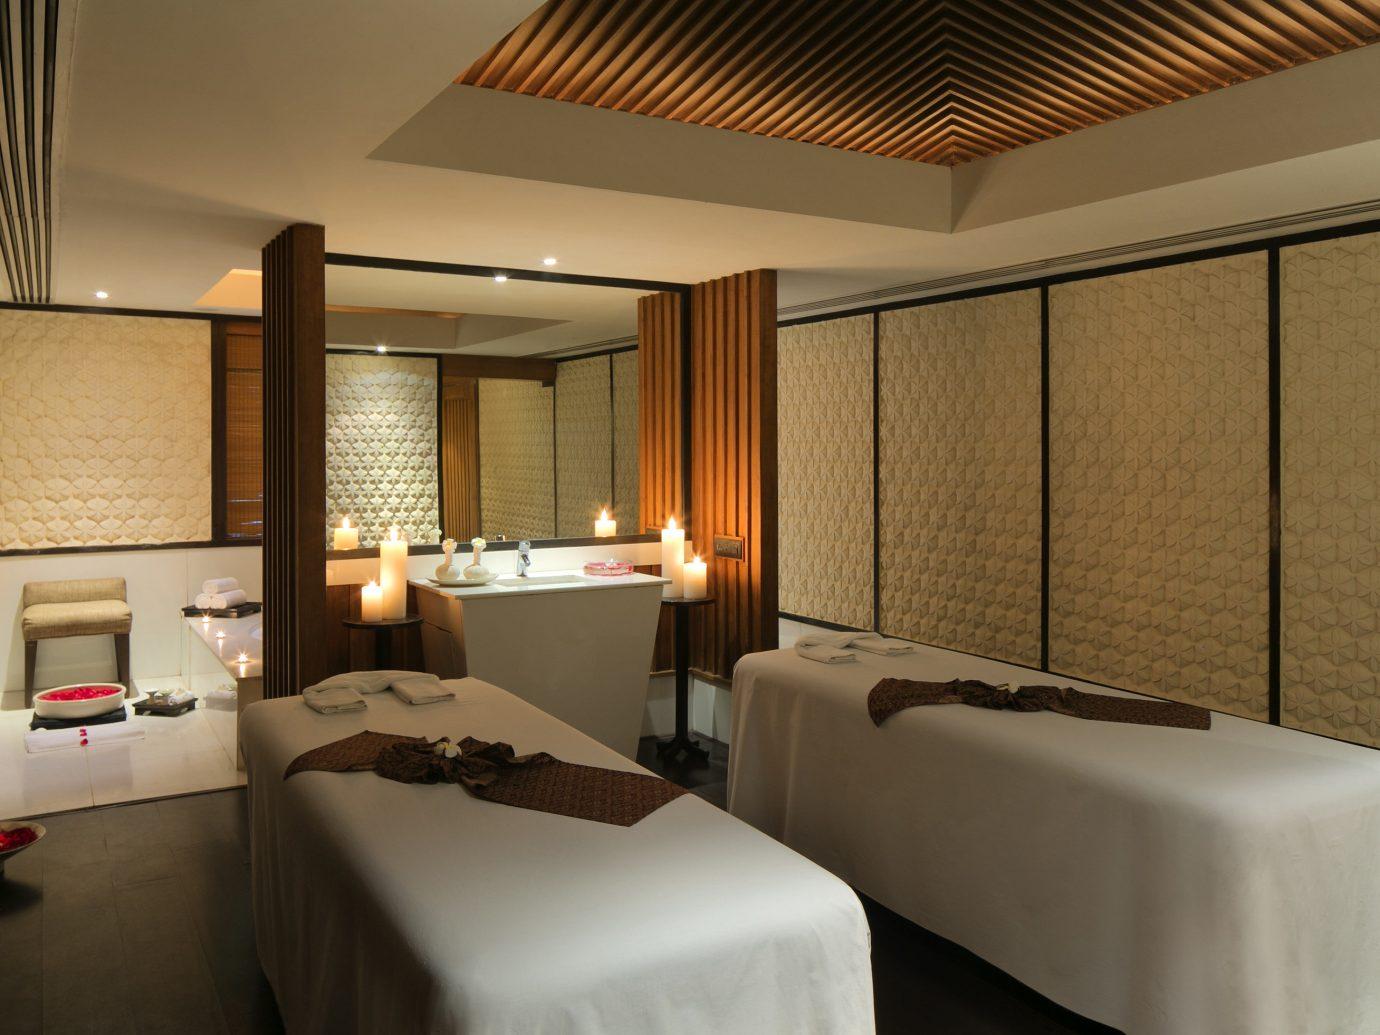 Hotels Luxury Travel indoor bed wall ceiling hotel room Bedroom interior design Suite interior designer furniture several